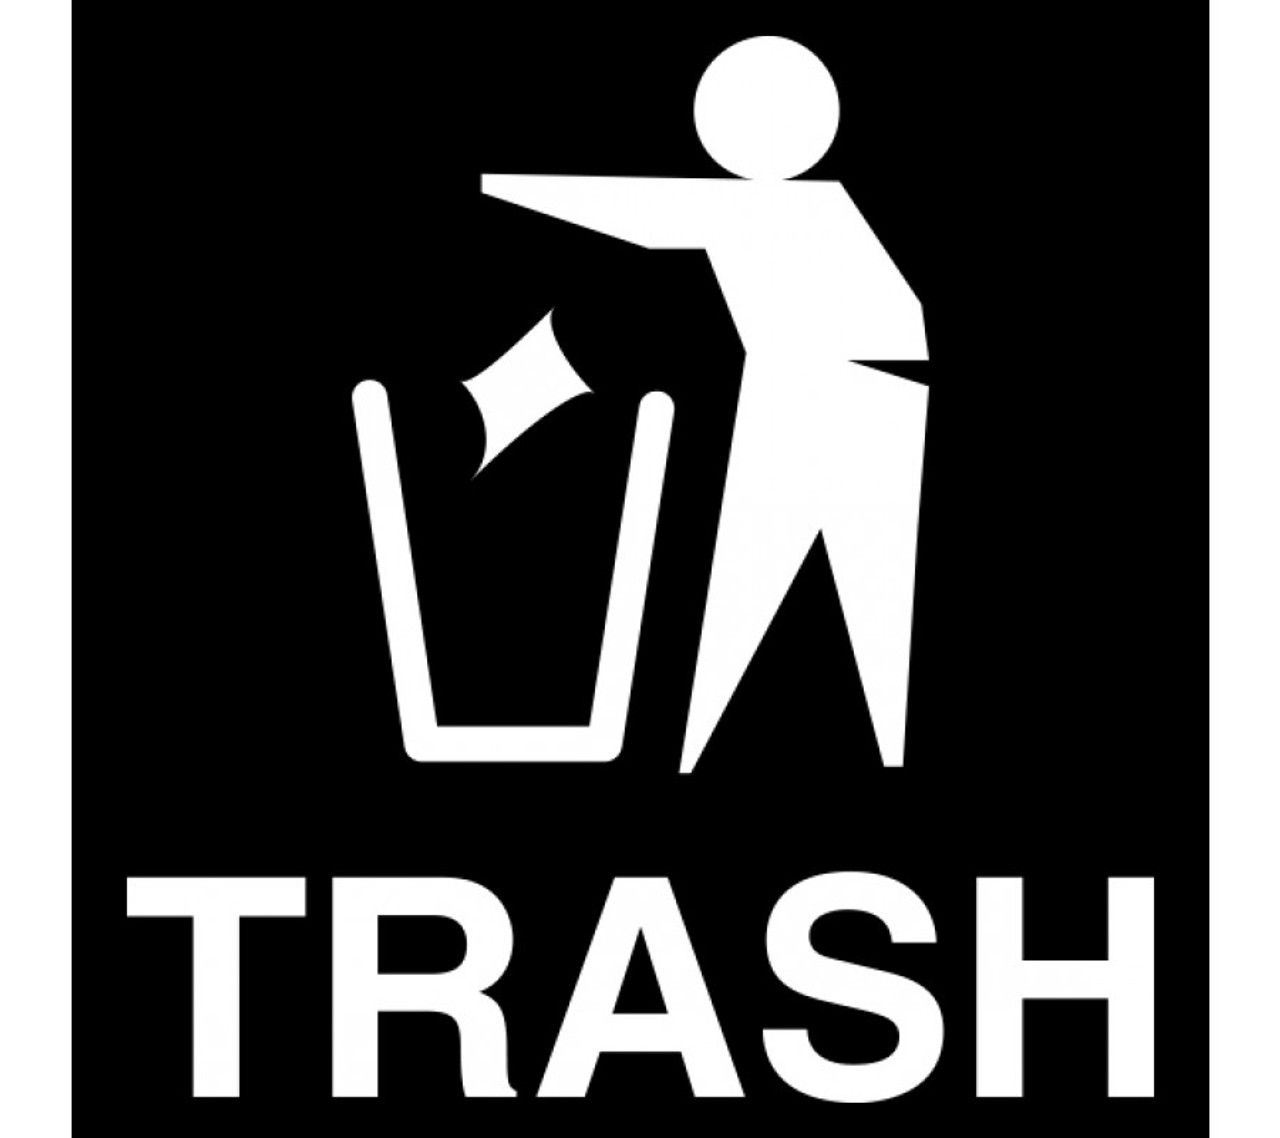 White Vinyl TRASH MAN Decal for Ellipse Trash Cans 45-RGU-002 FG